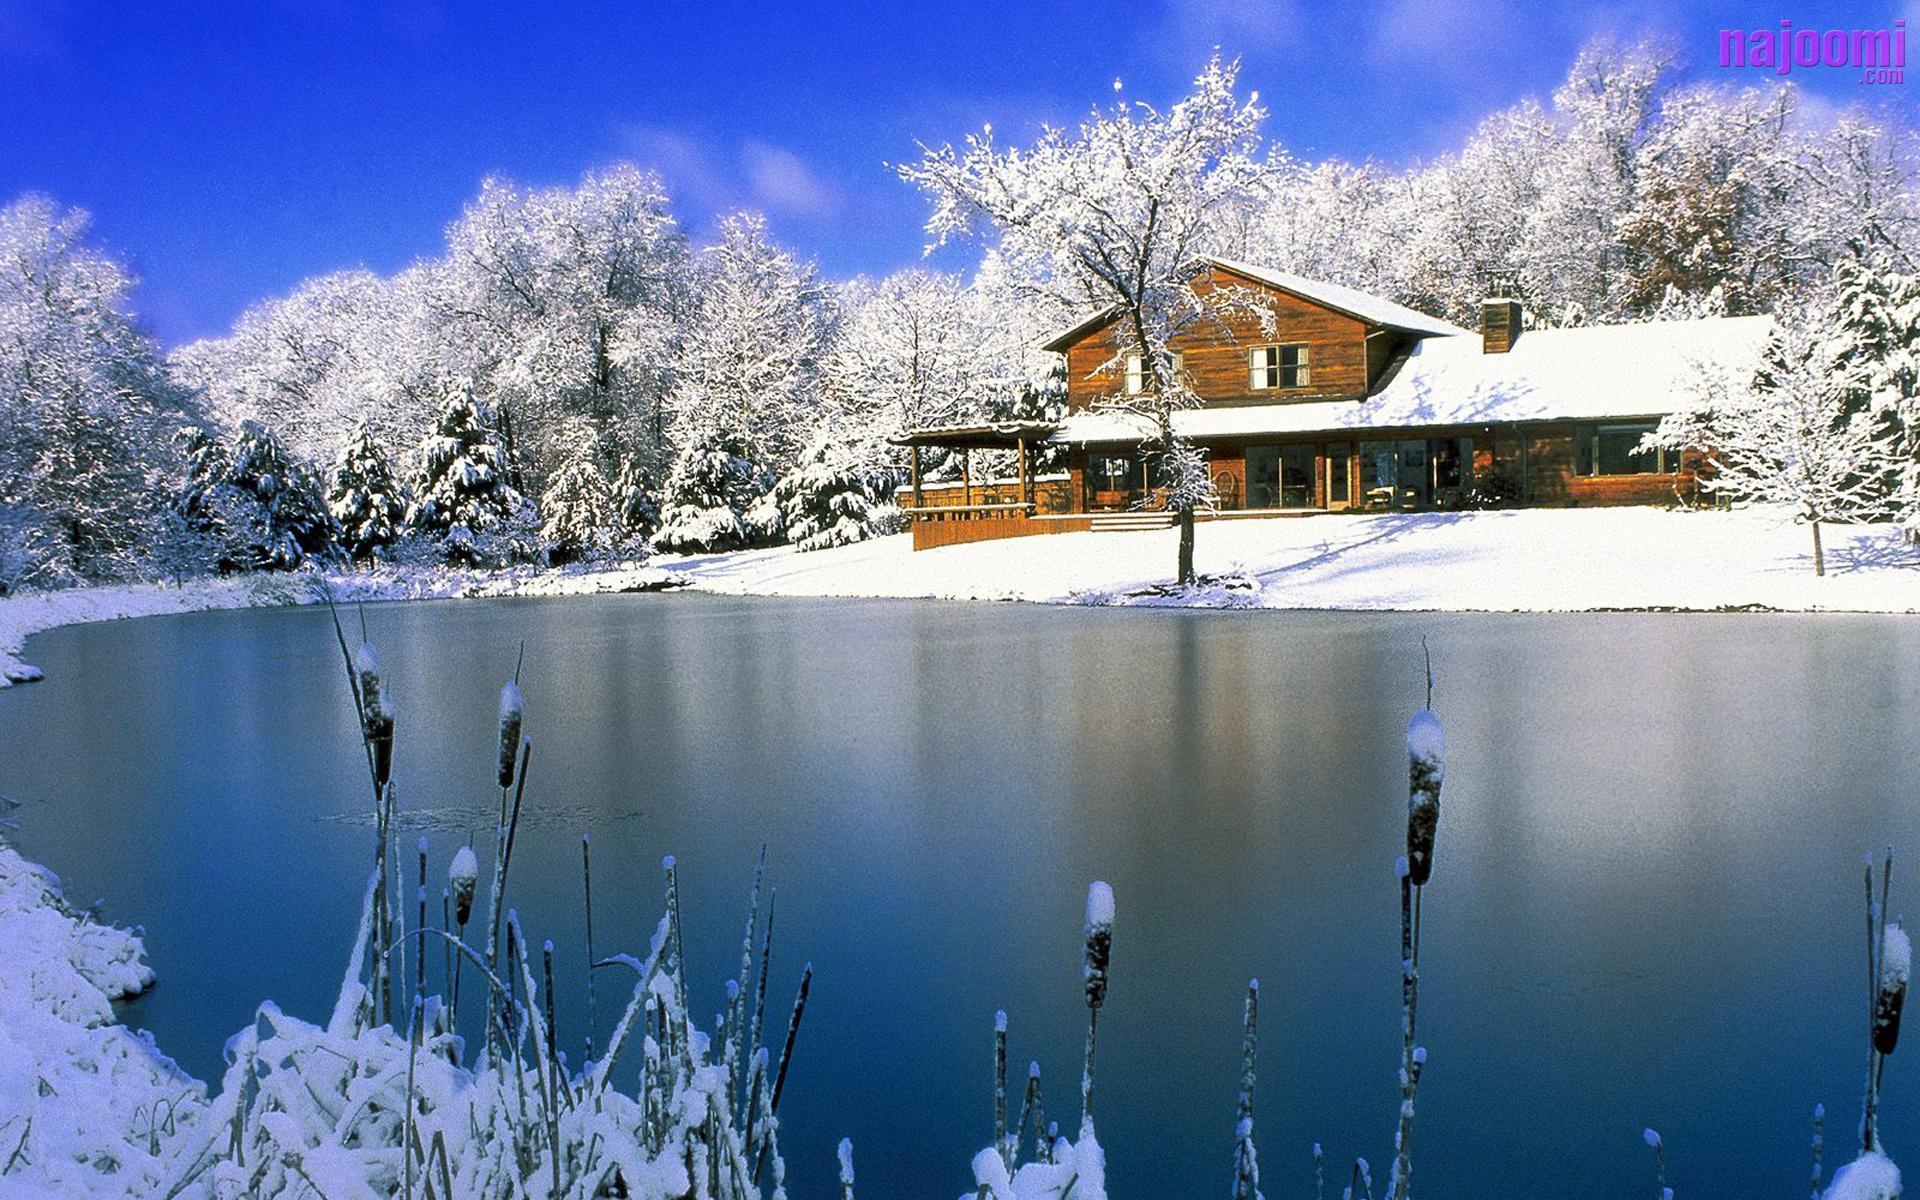 ilona wallpapers beautiful snowy - photo #5